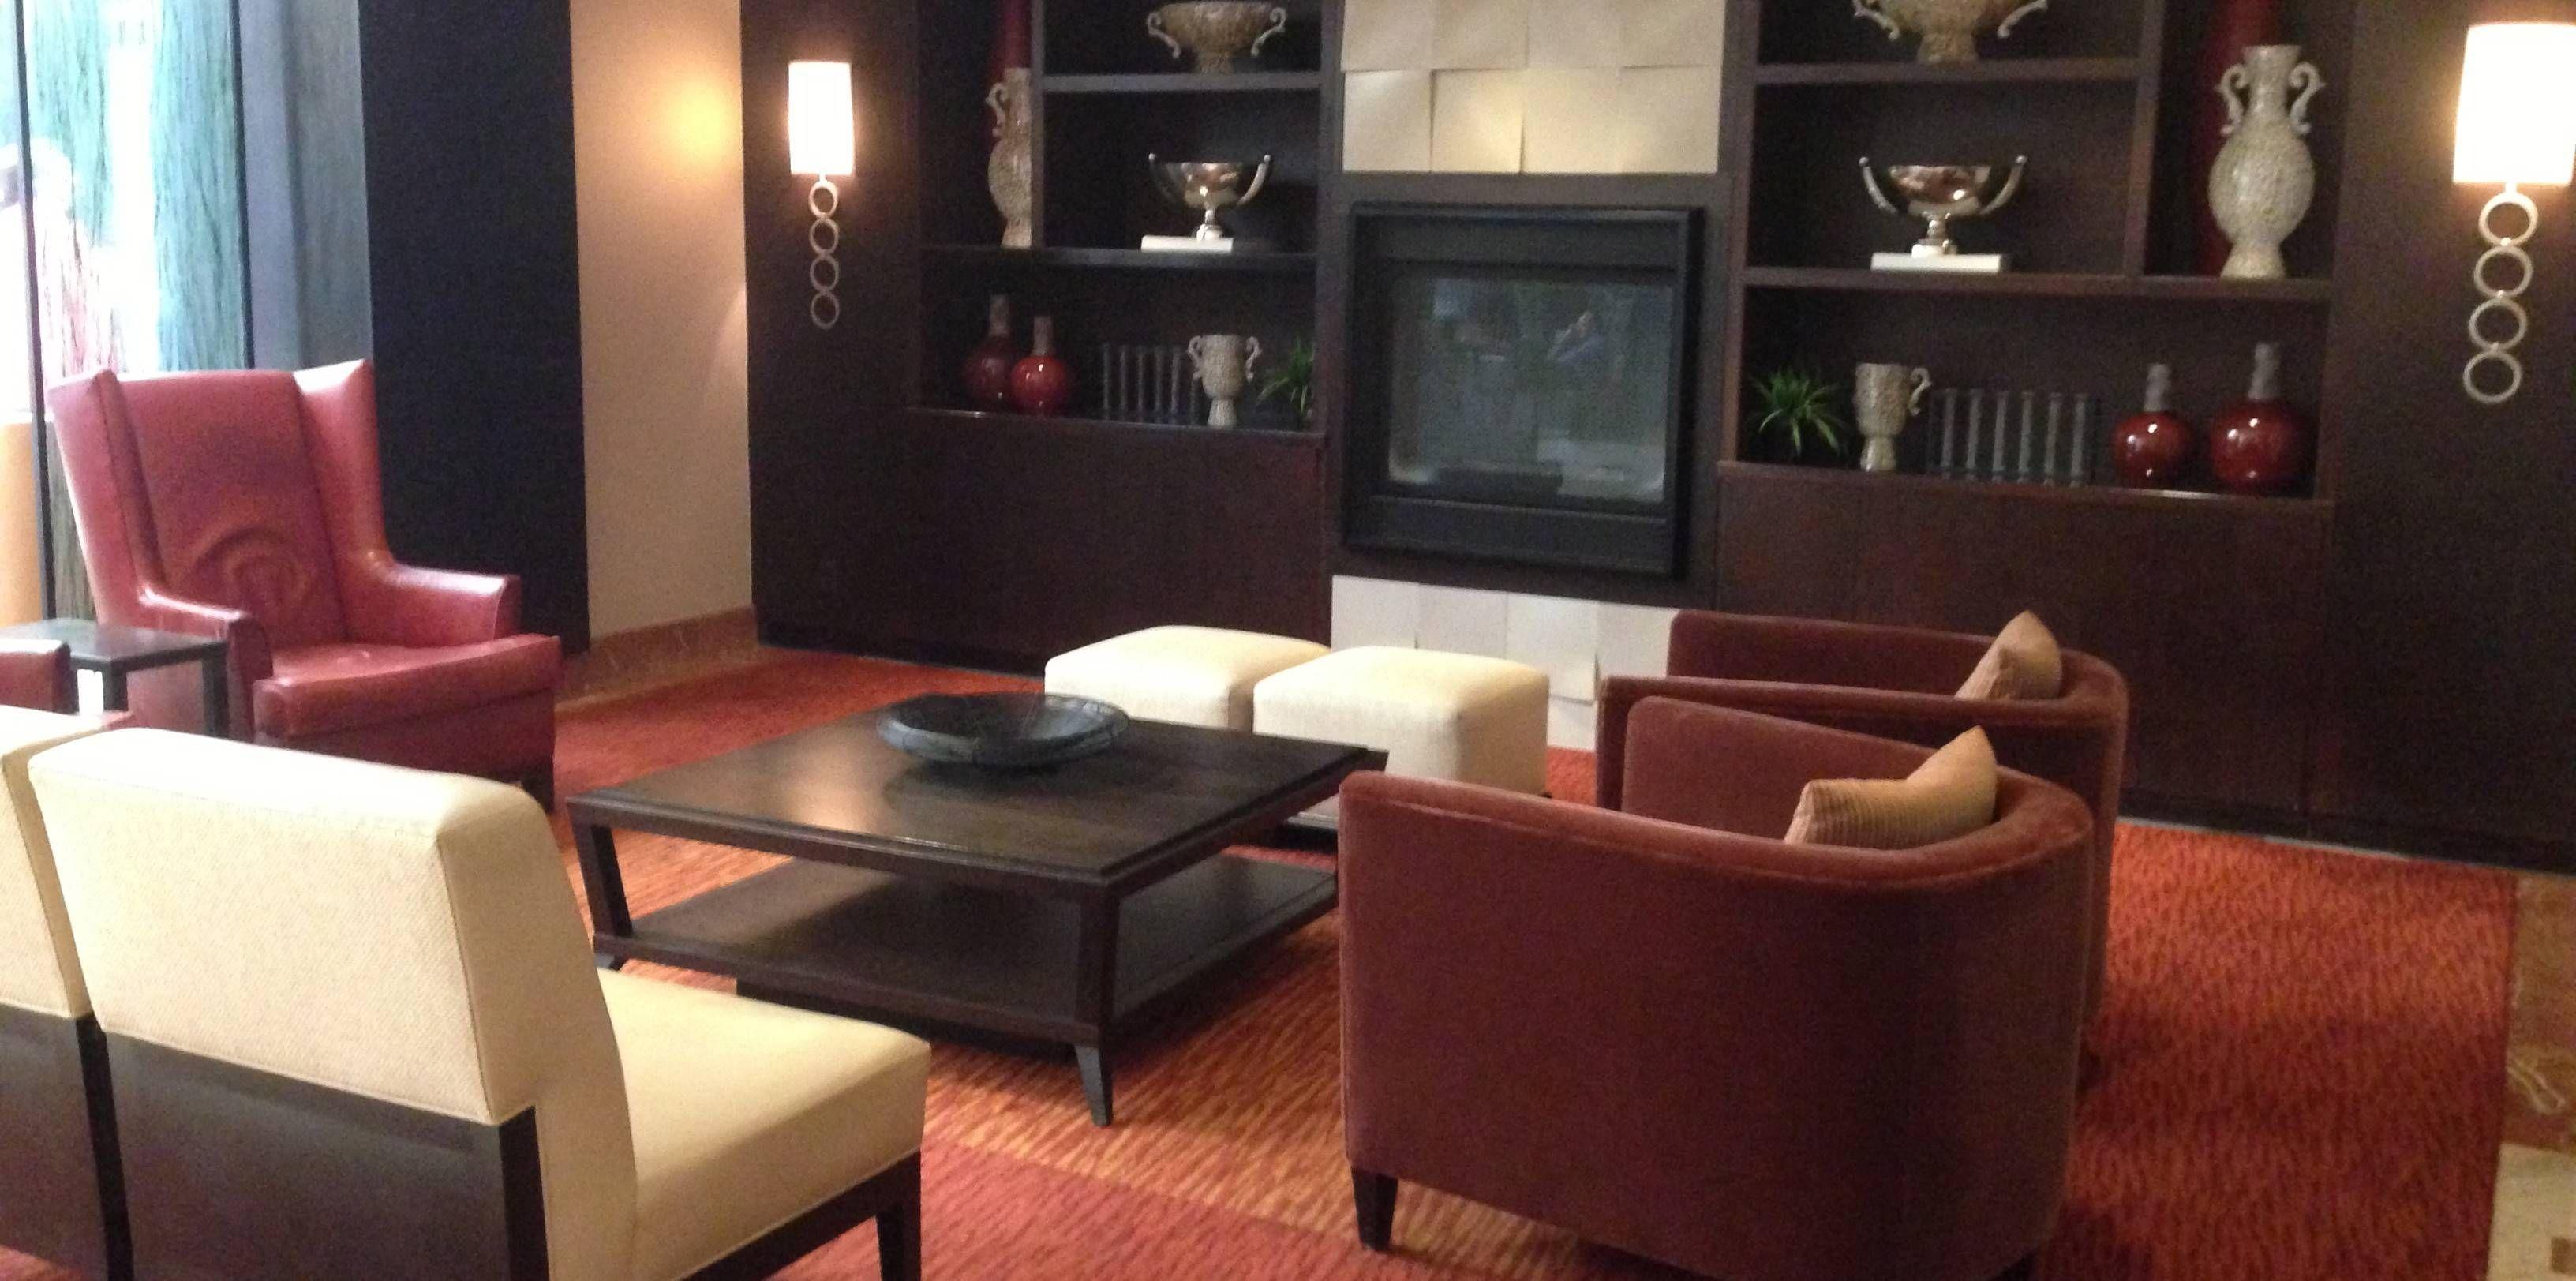 Hotel Hilton Rosemont – Chicago O'Hare